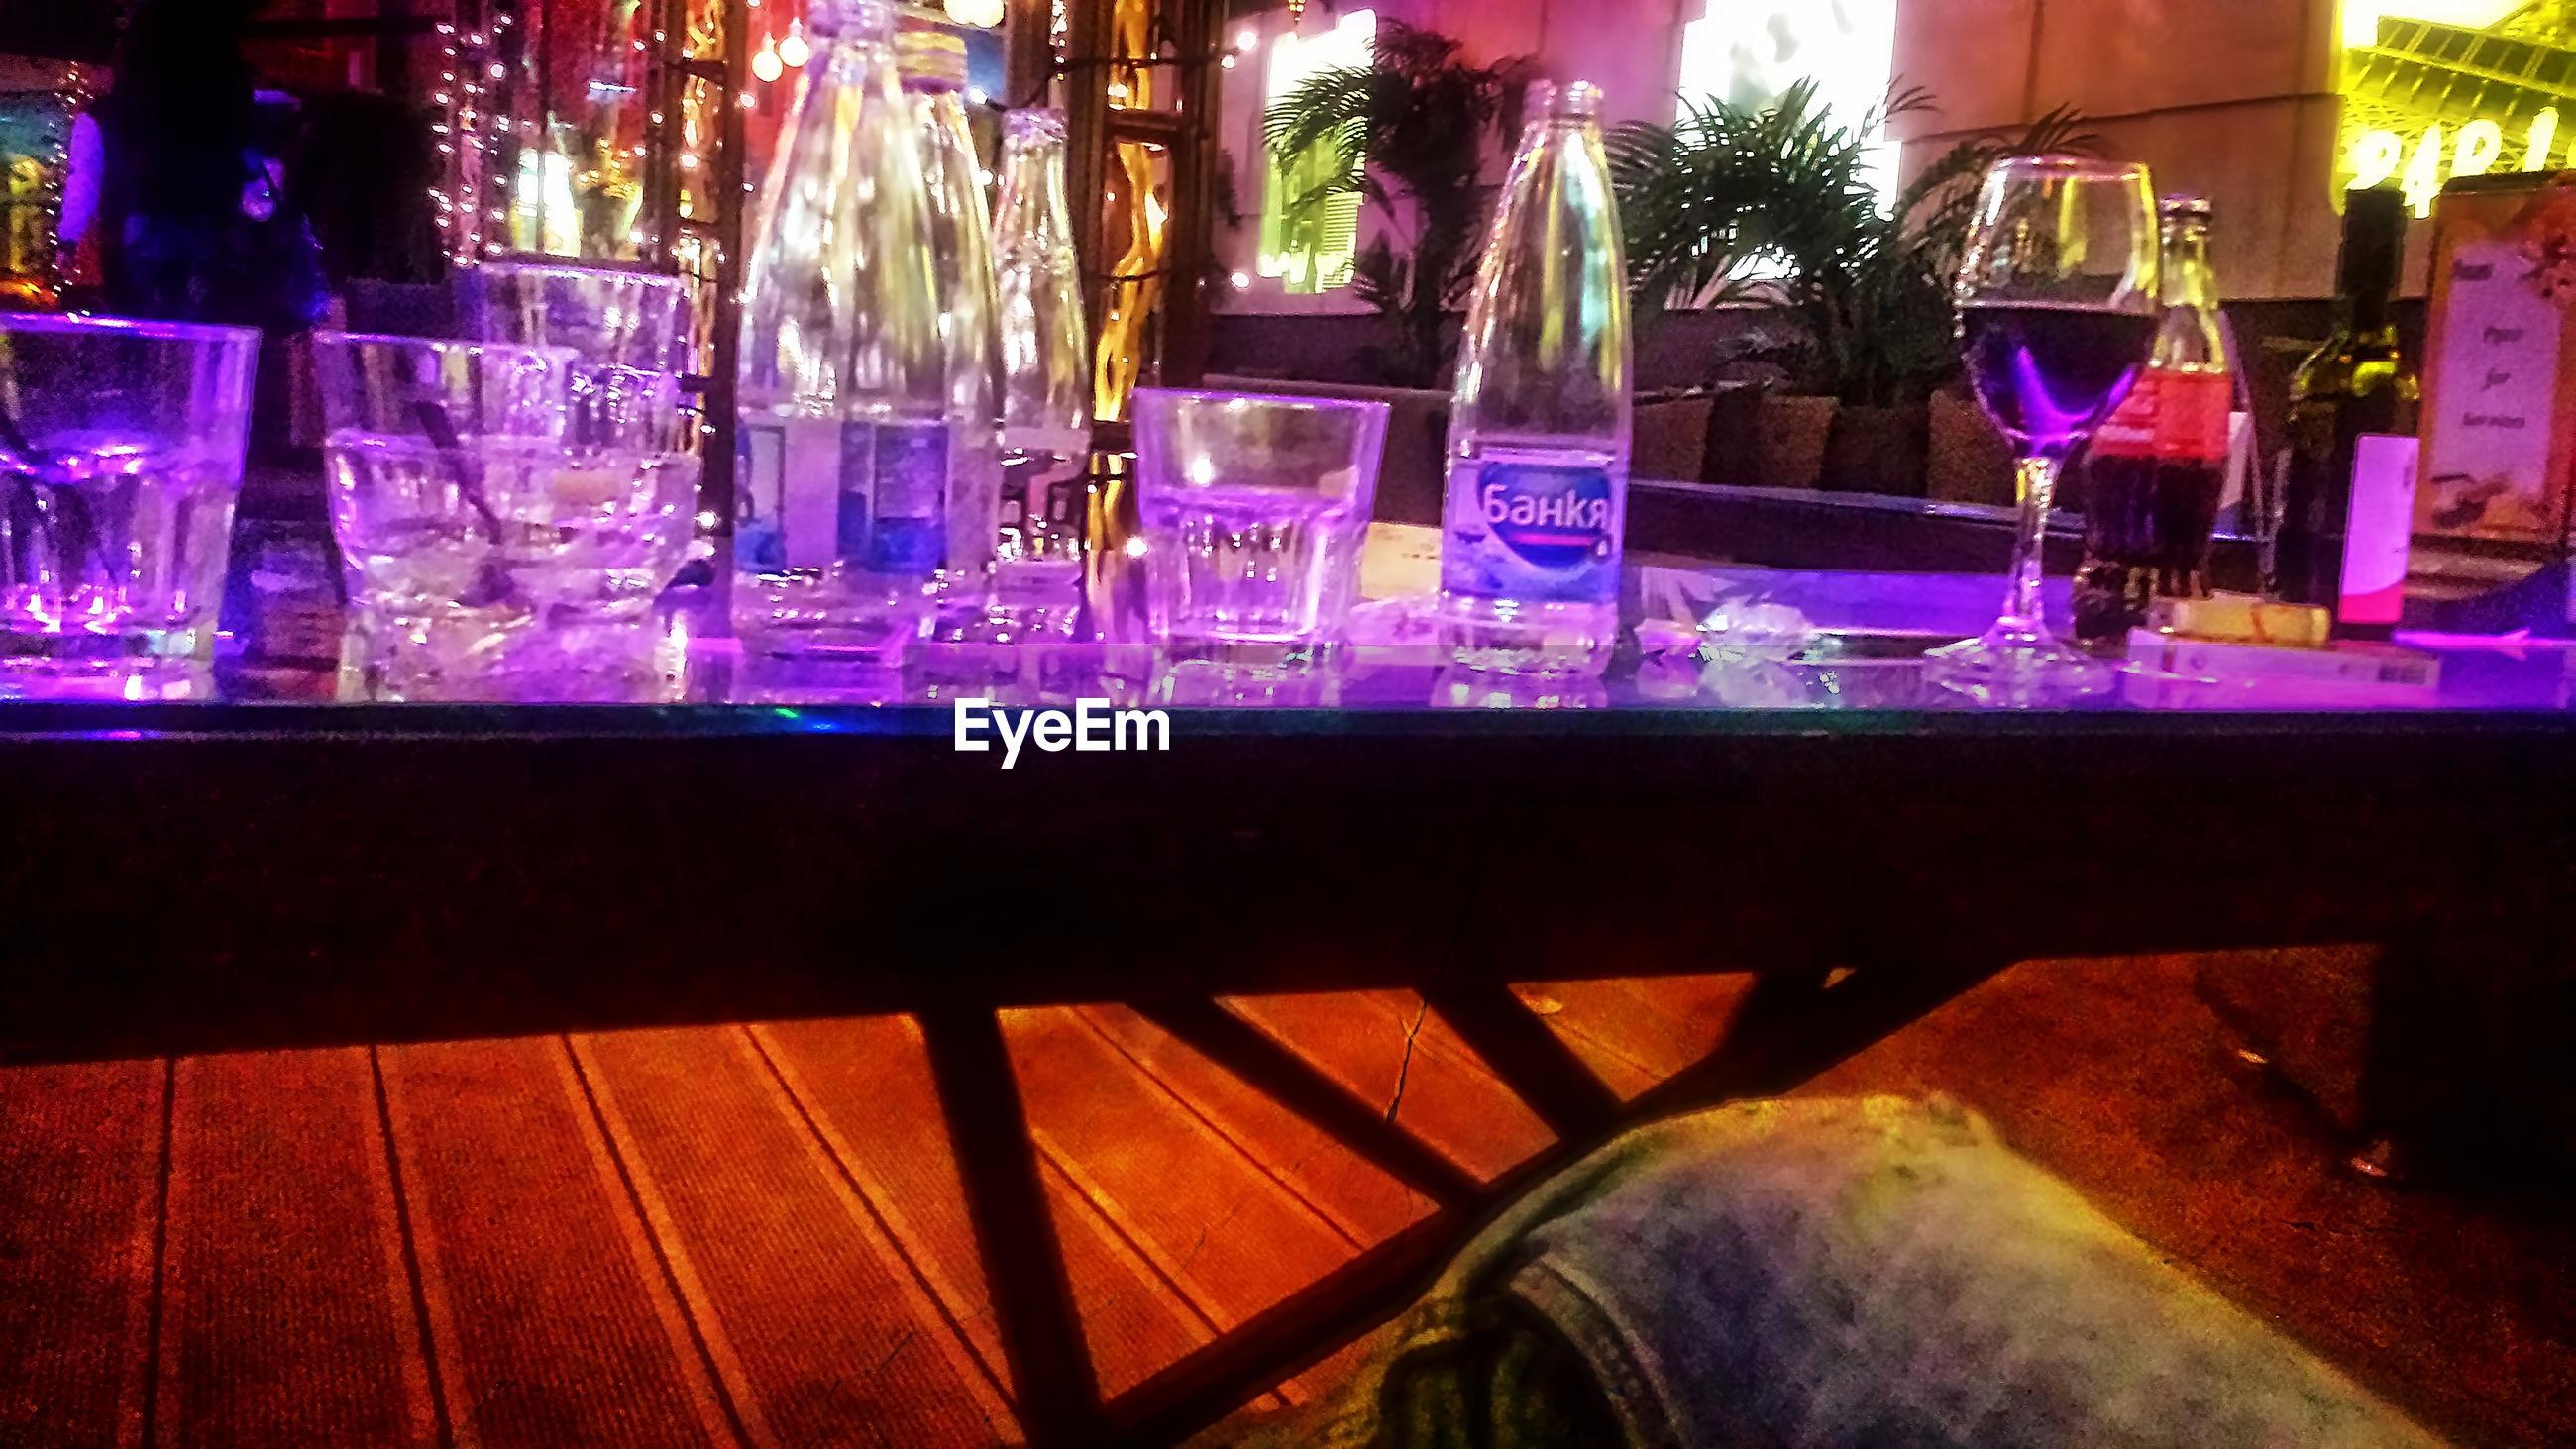 bar - drink establishment, table, bar, night, bar counter, alcohol, illuminated, nightclub, indoors, no people